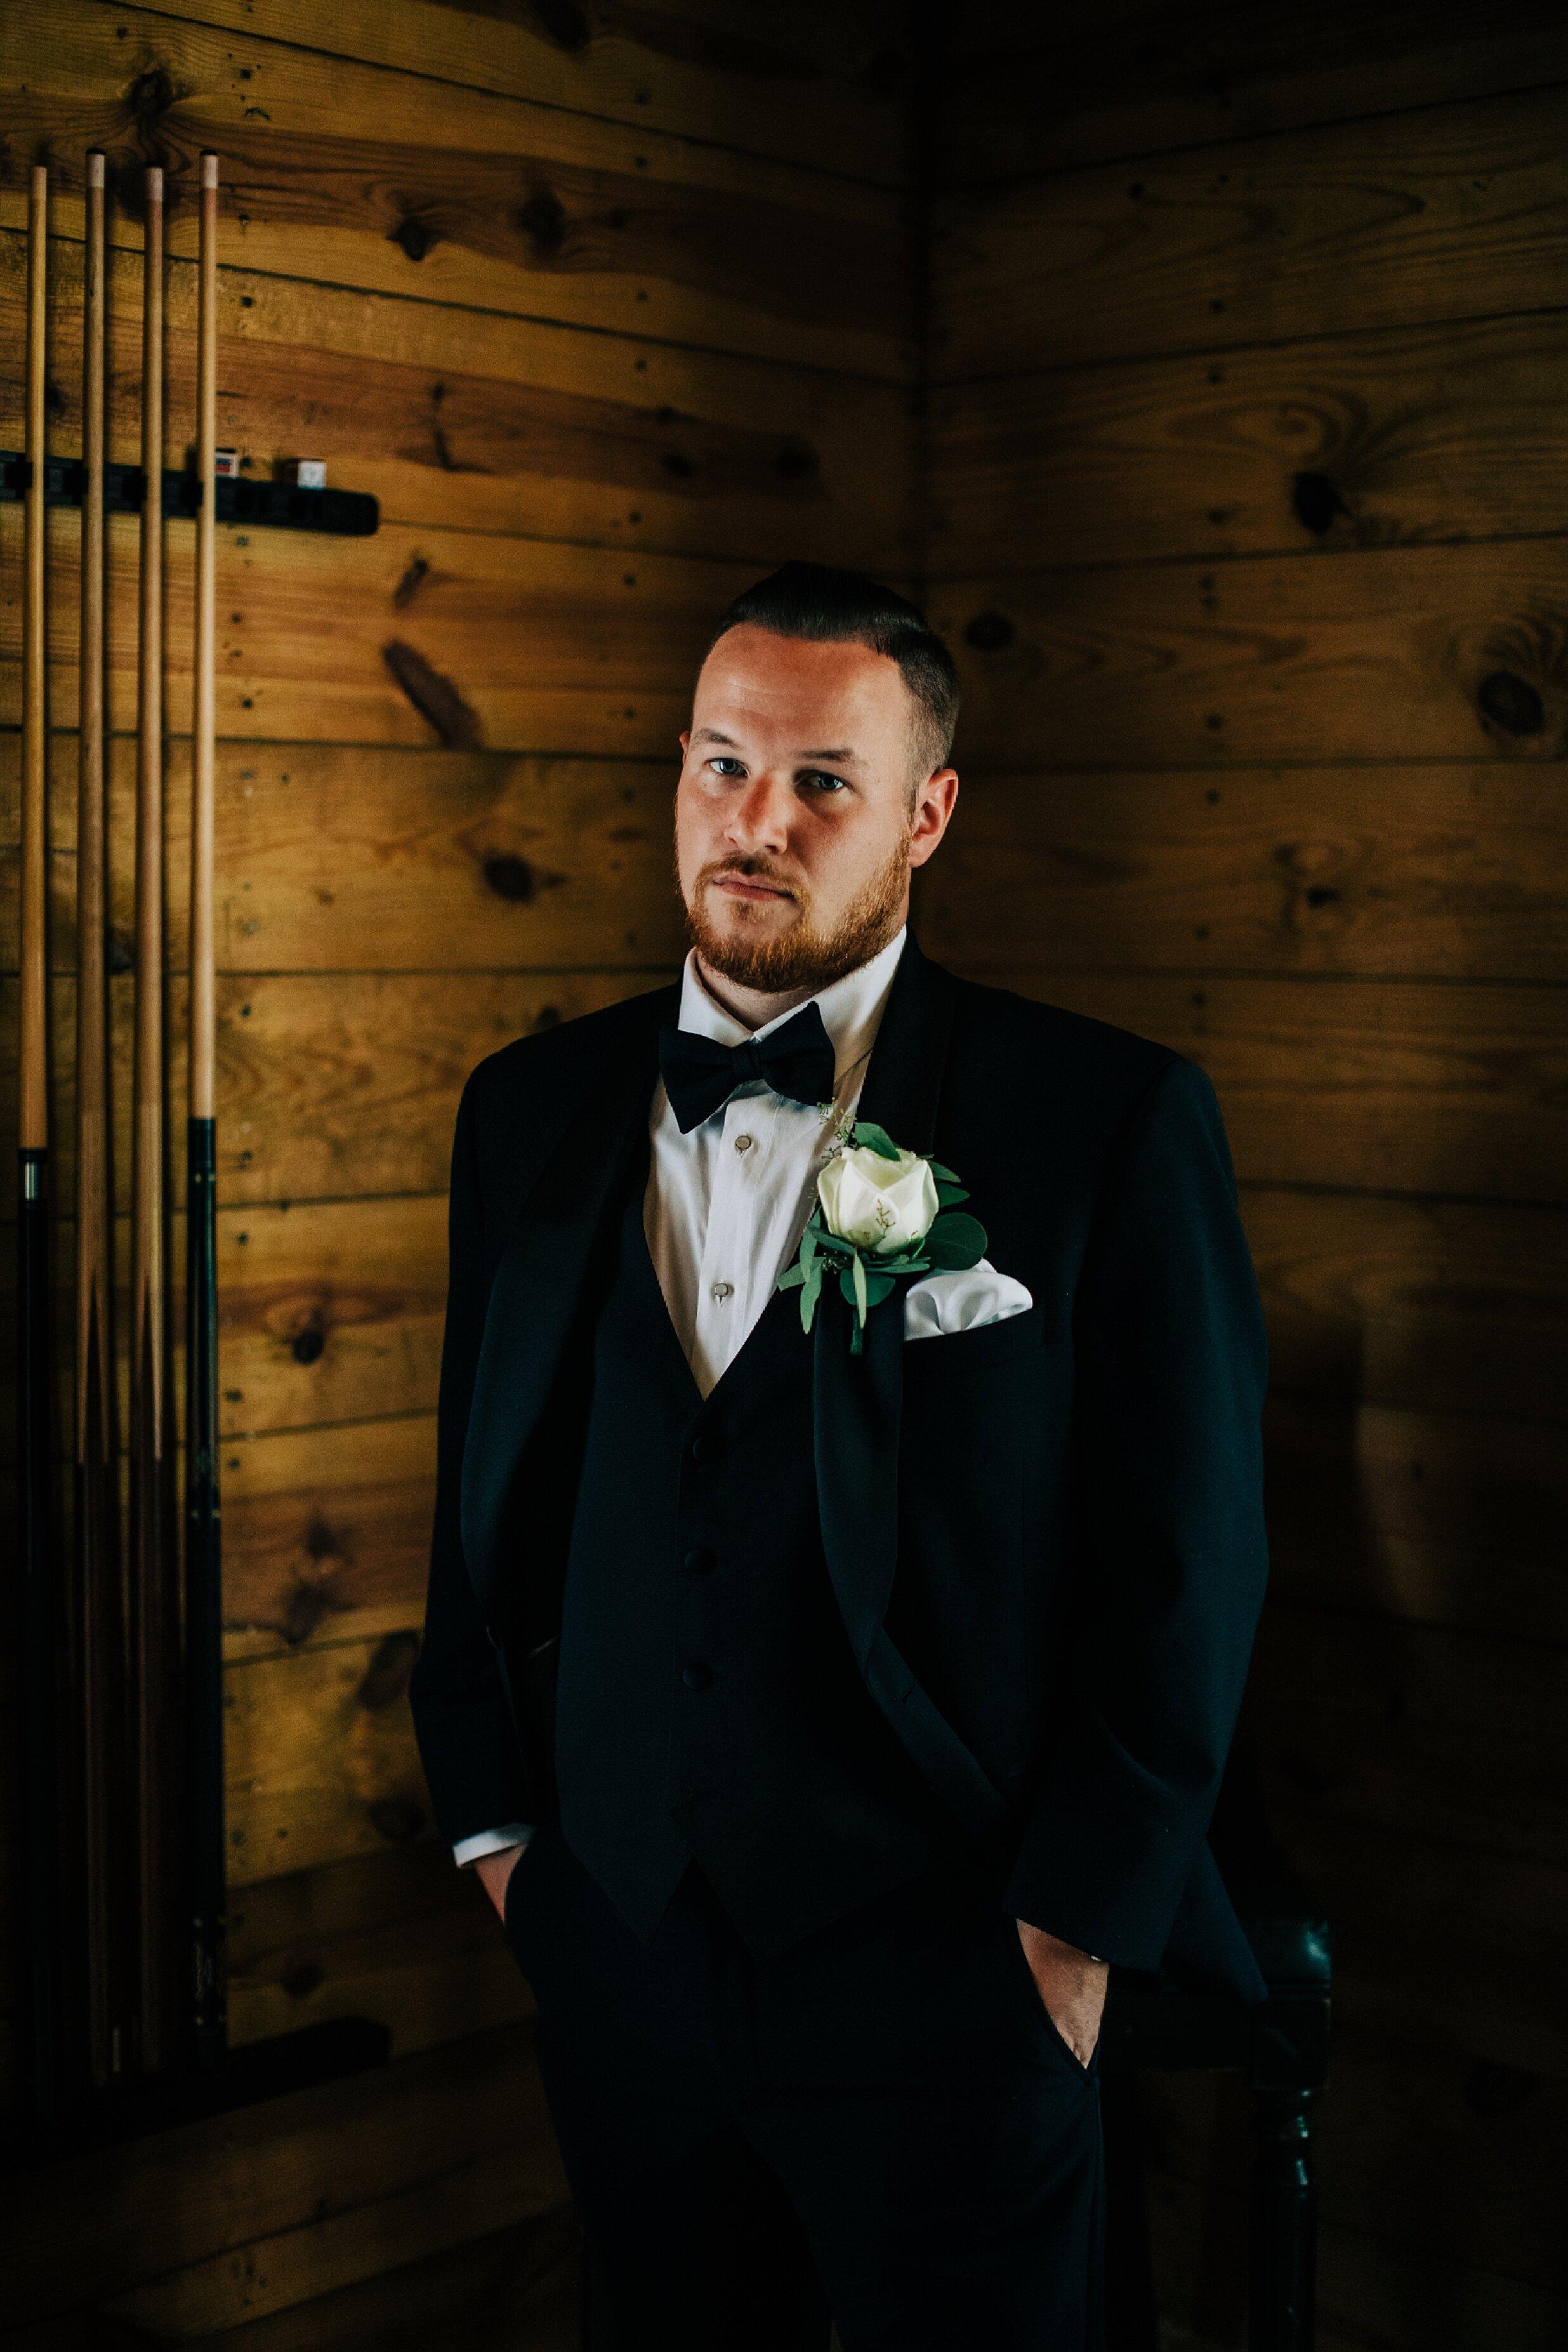 ryland-inn-nj-photographer-wedding_0042.jpg